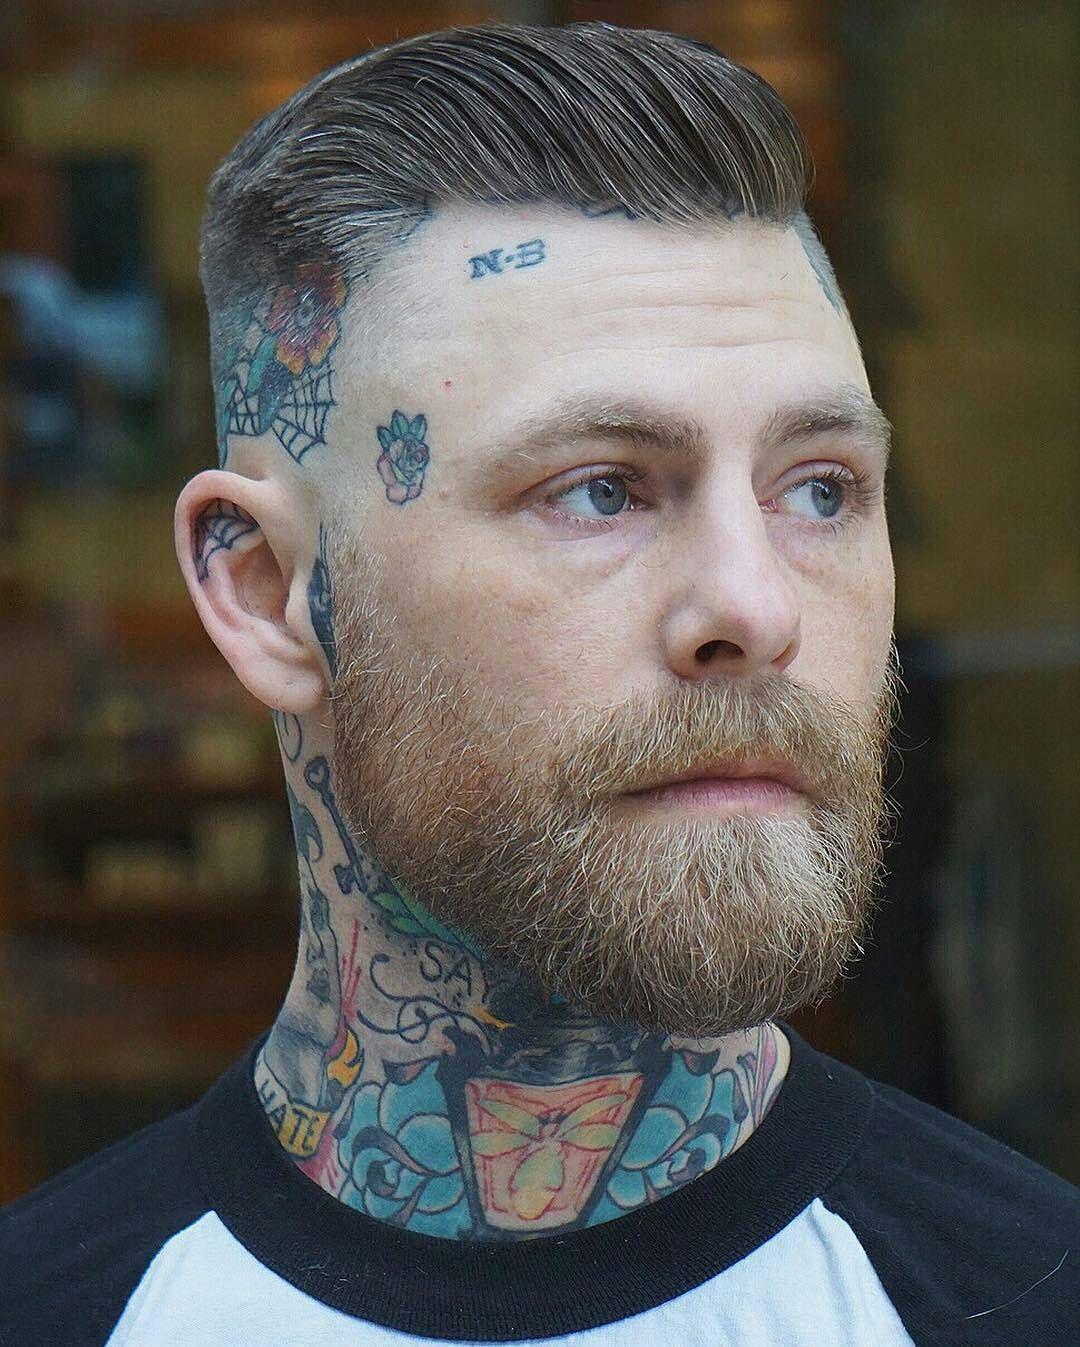 Modern pompadour beard - Skin Fade Side Part Pompadour Styled With Box Beard